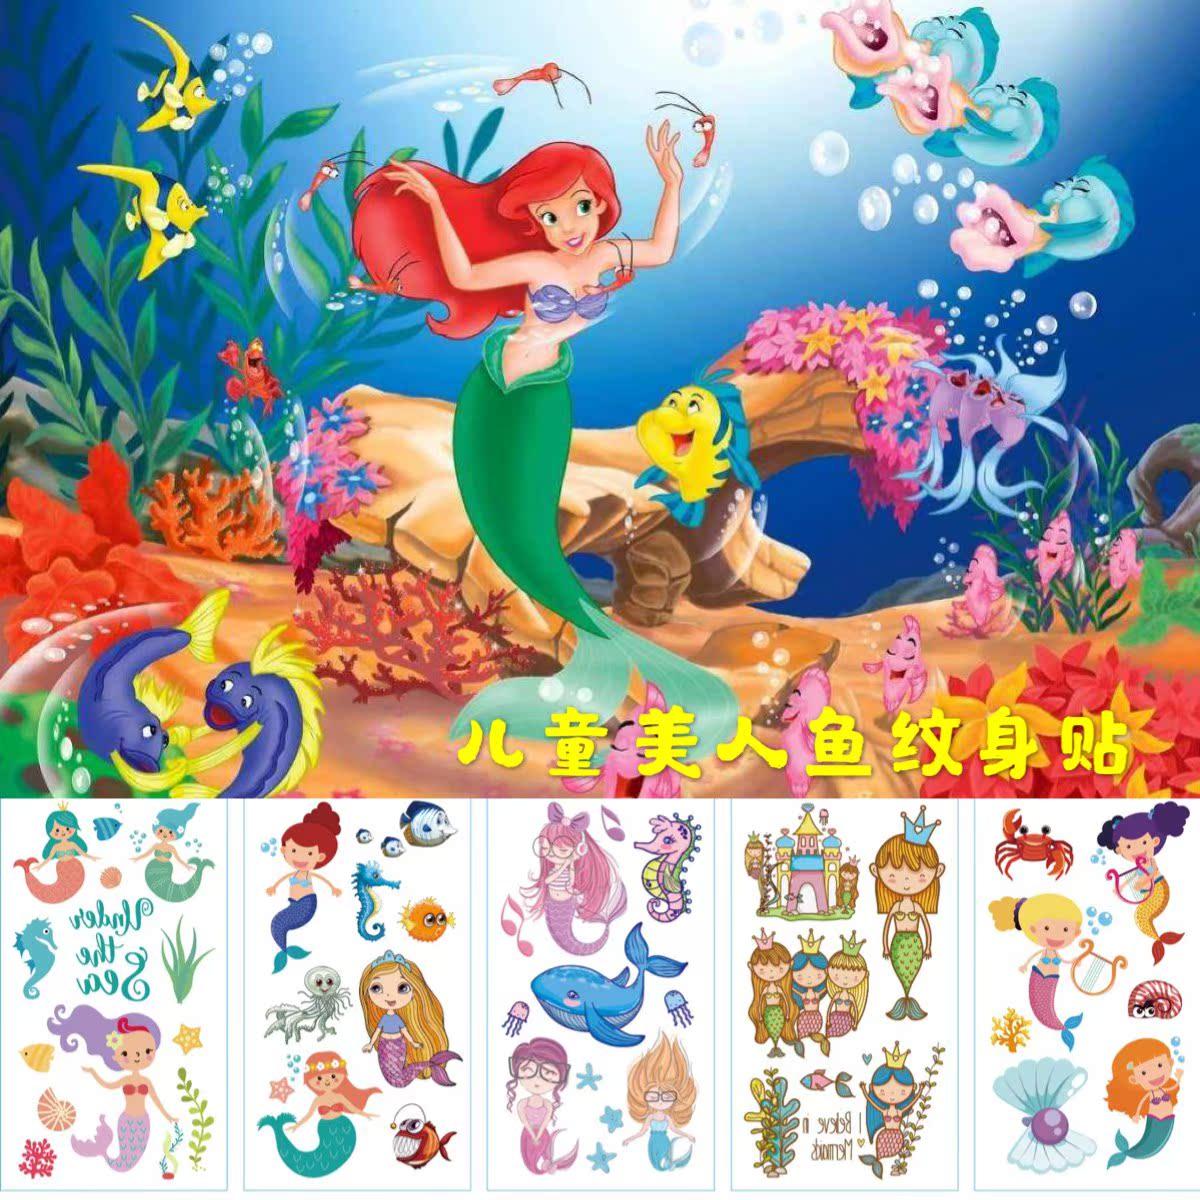 Childrens waterproof tattoo stickers cute cartoon Mermaid Princess Fairy Magic Stick conch body painting paste.